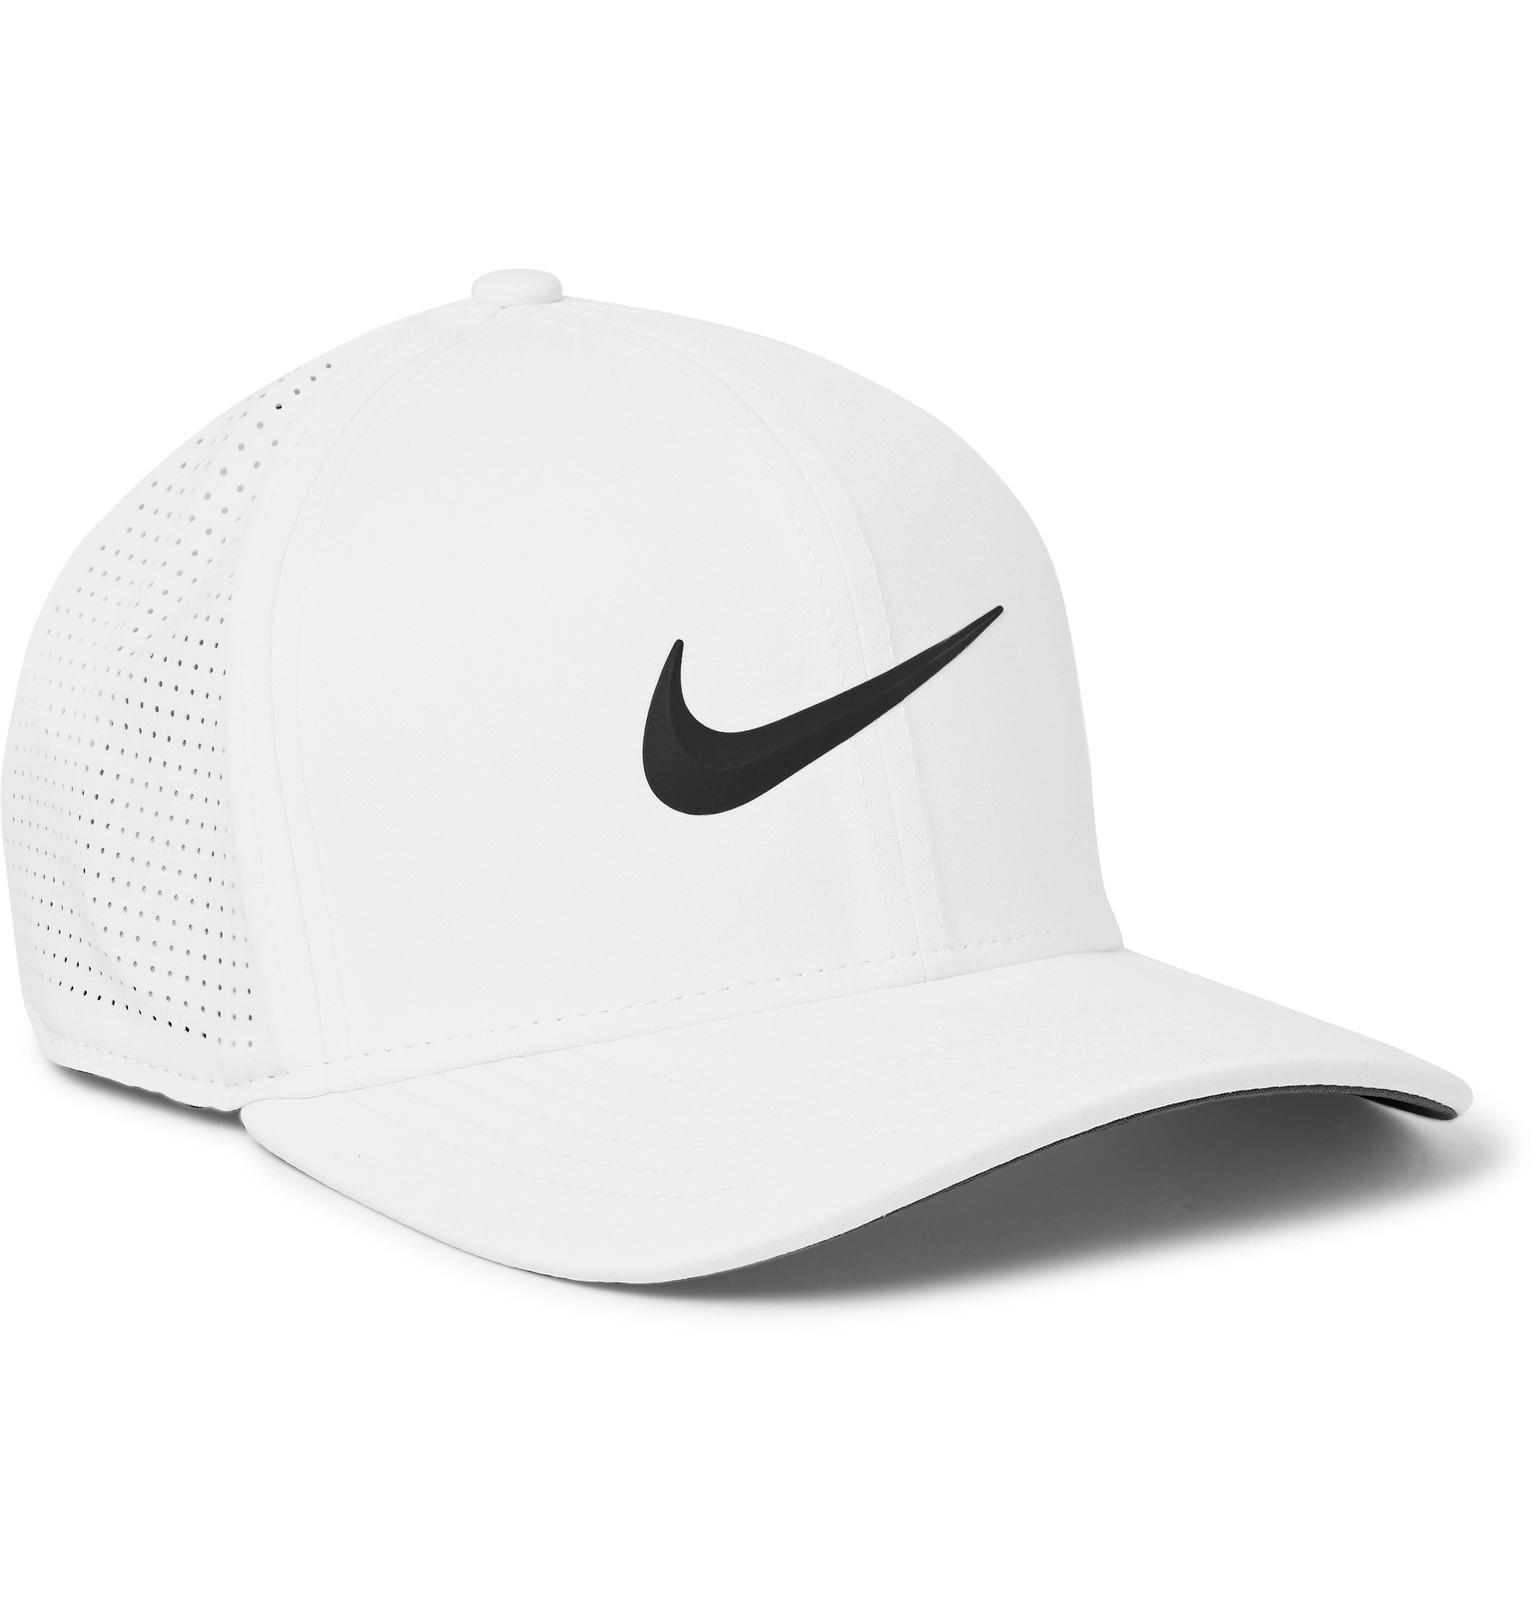 04d073cdd65 Lyst - Nike Aerobill Classic 99 Perforated Dri-fit Golf Cap in White ...